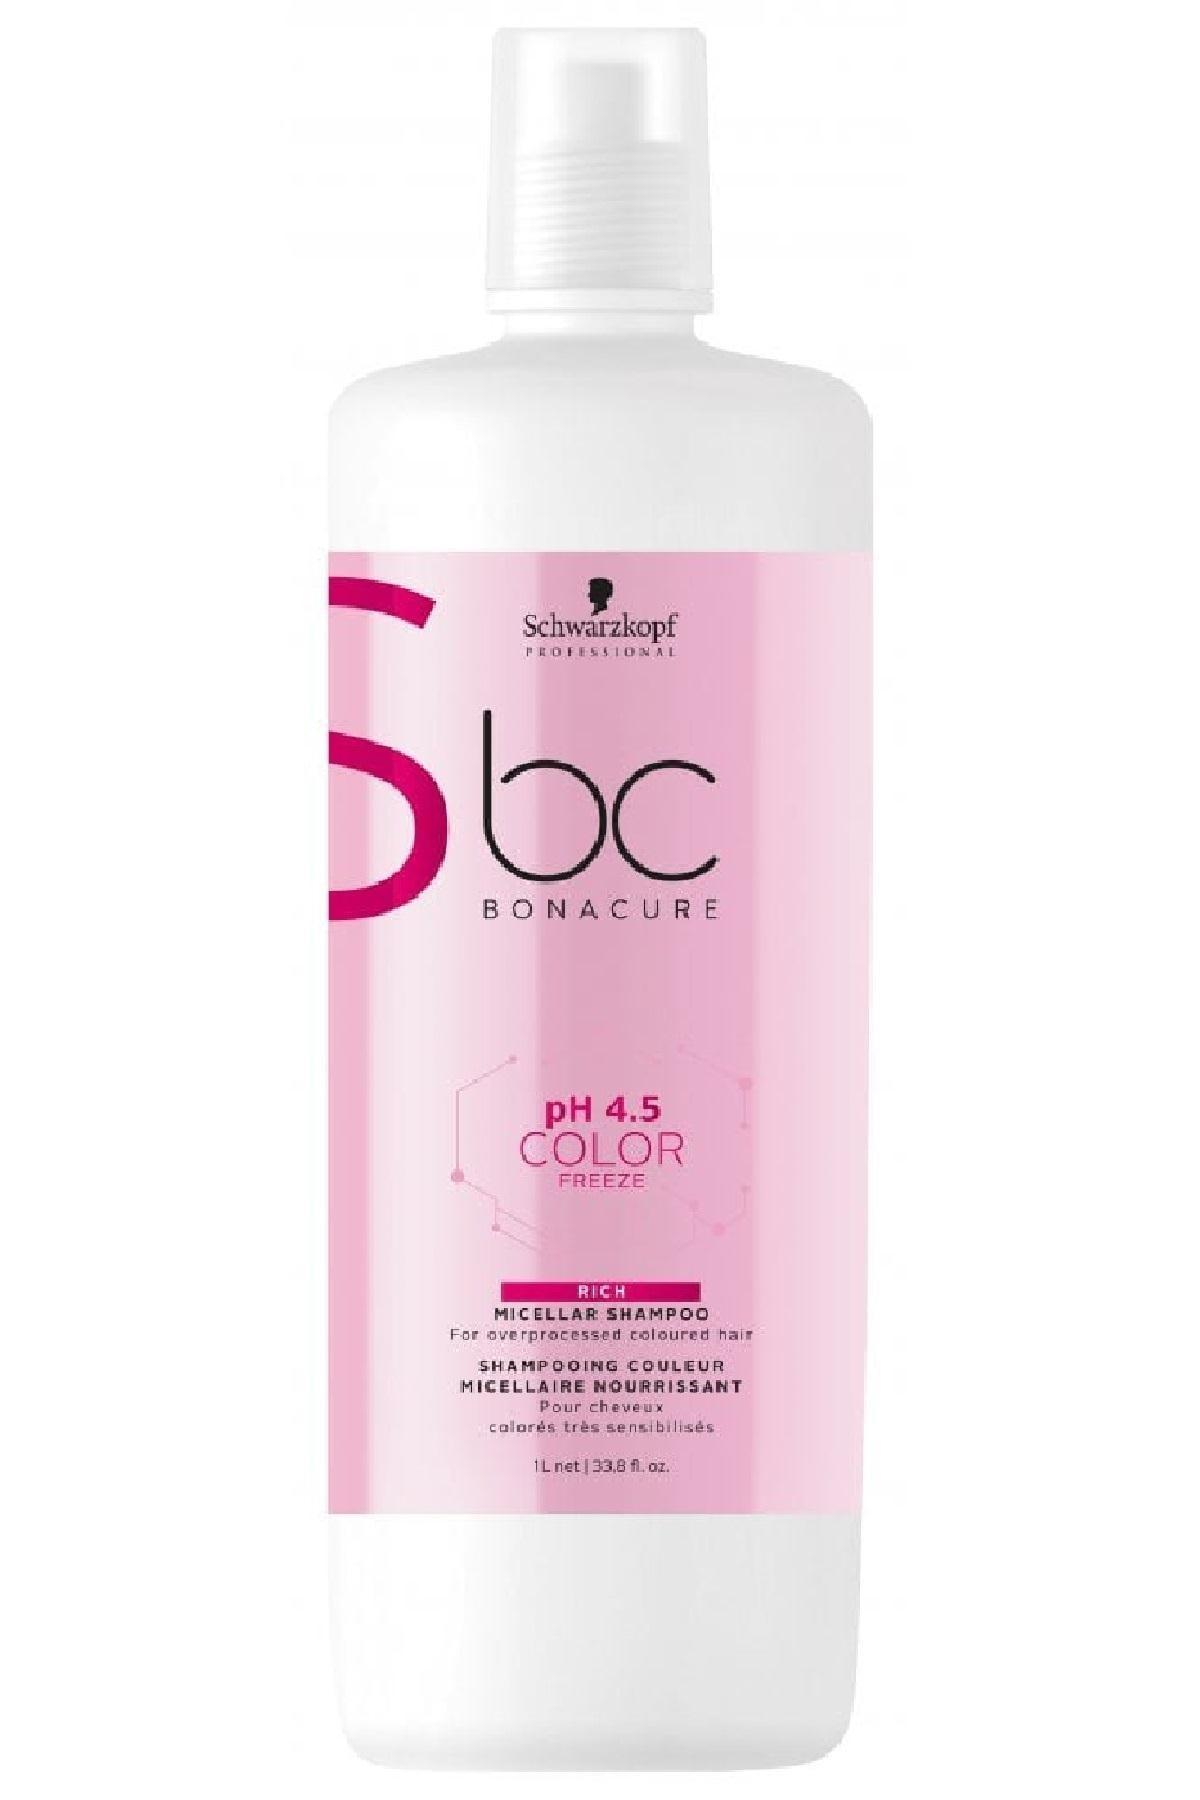 Bonacure pH 4.5 Renk Koruma Zengin Micellar Şampuan 1000 ml 4045787426441 1